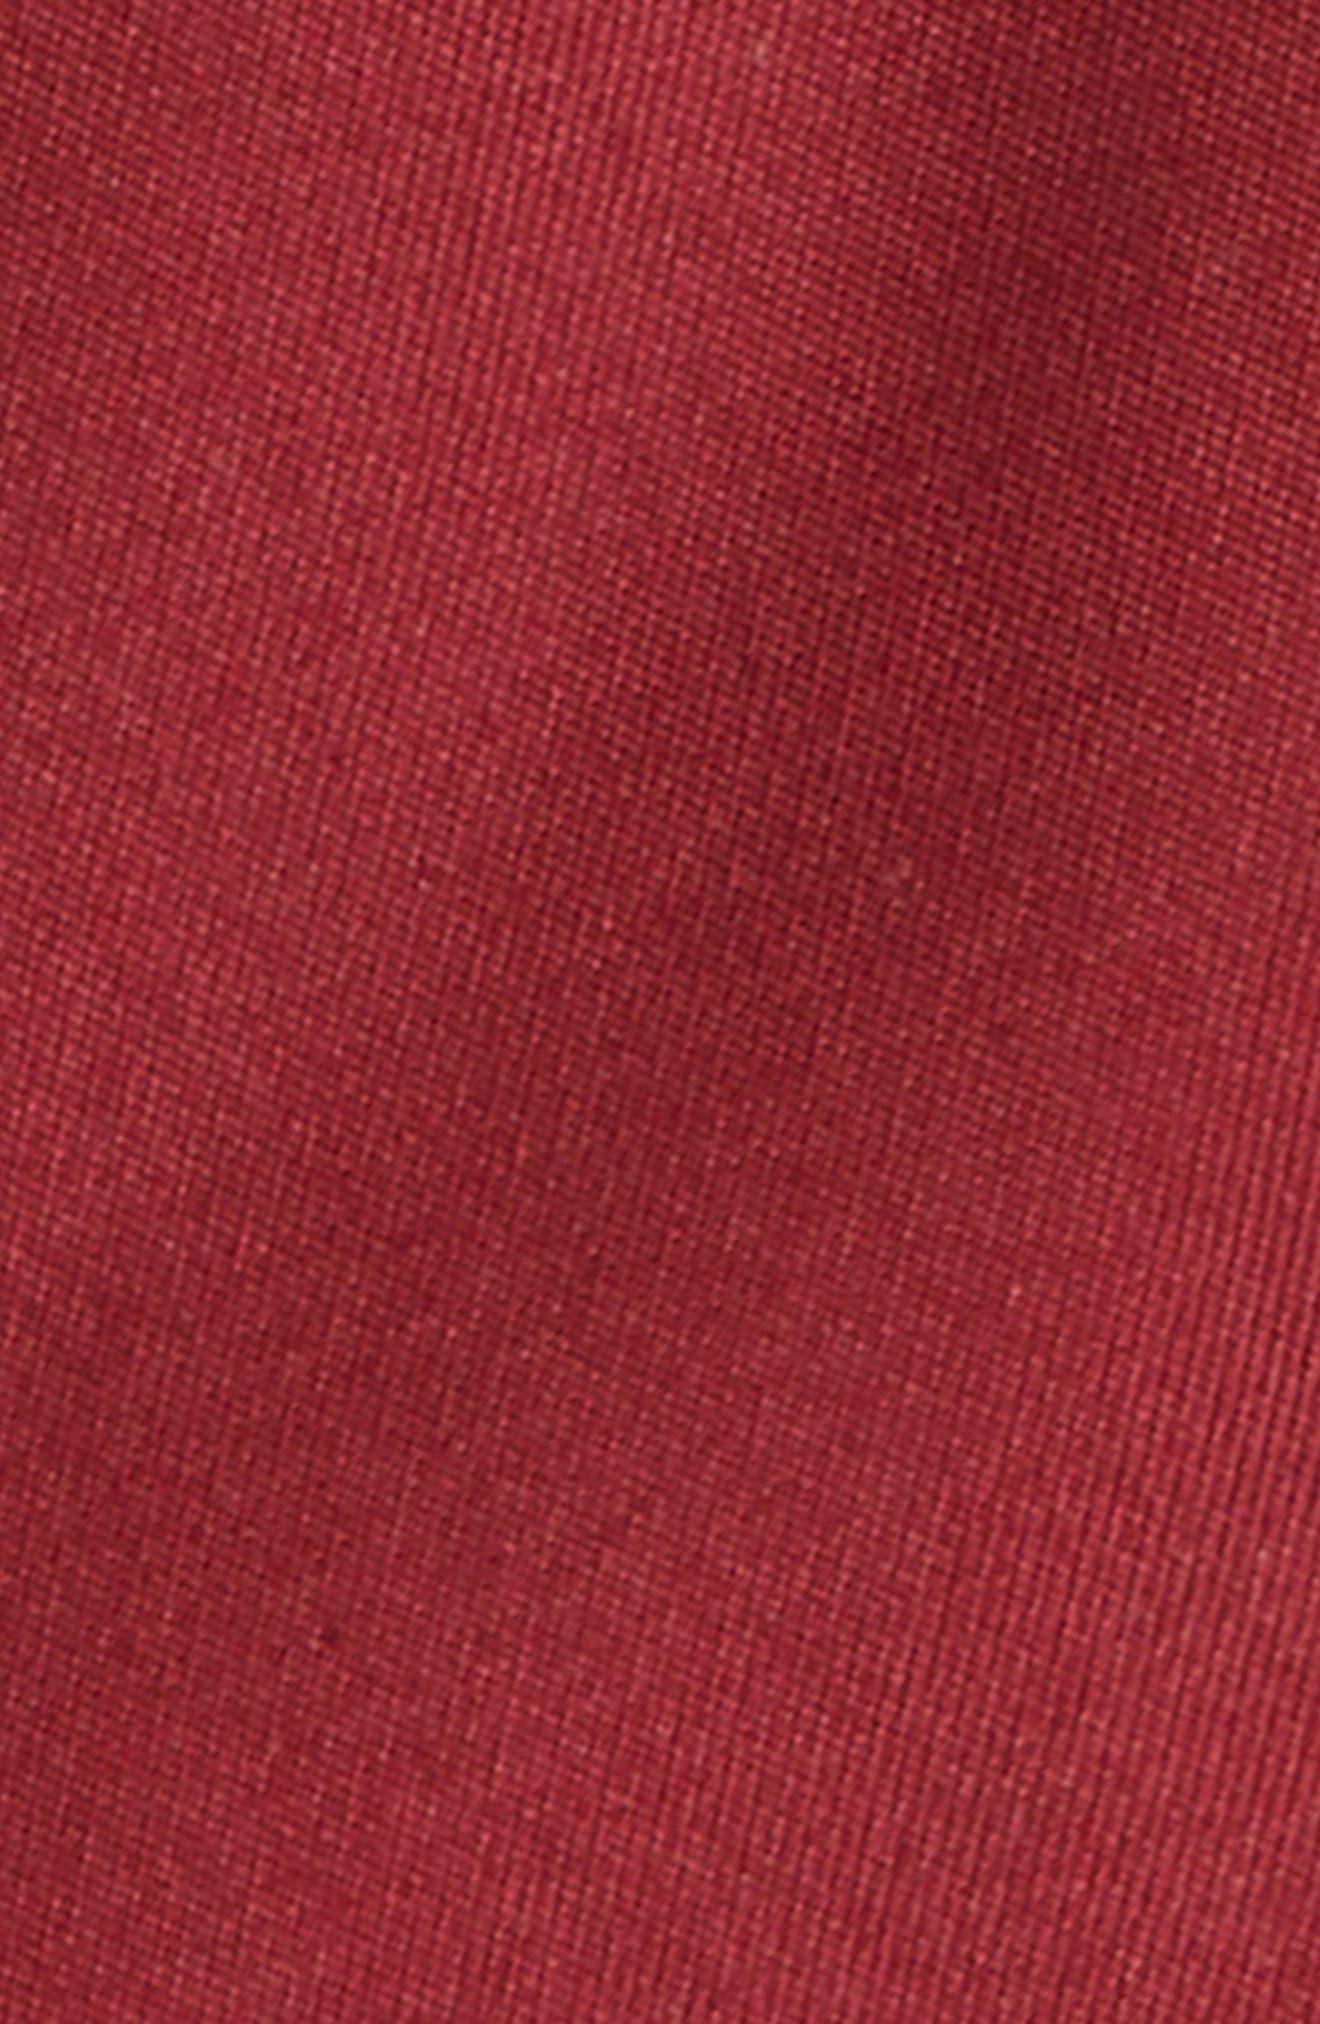 Matte Satin Silk Tie,                             Alternate thumbnail 2, color,                             Burgundy